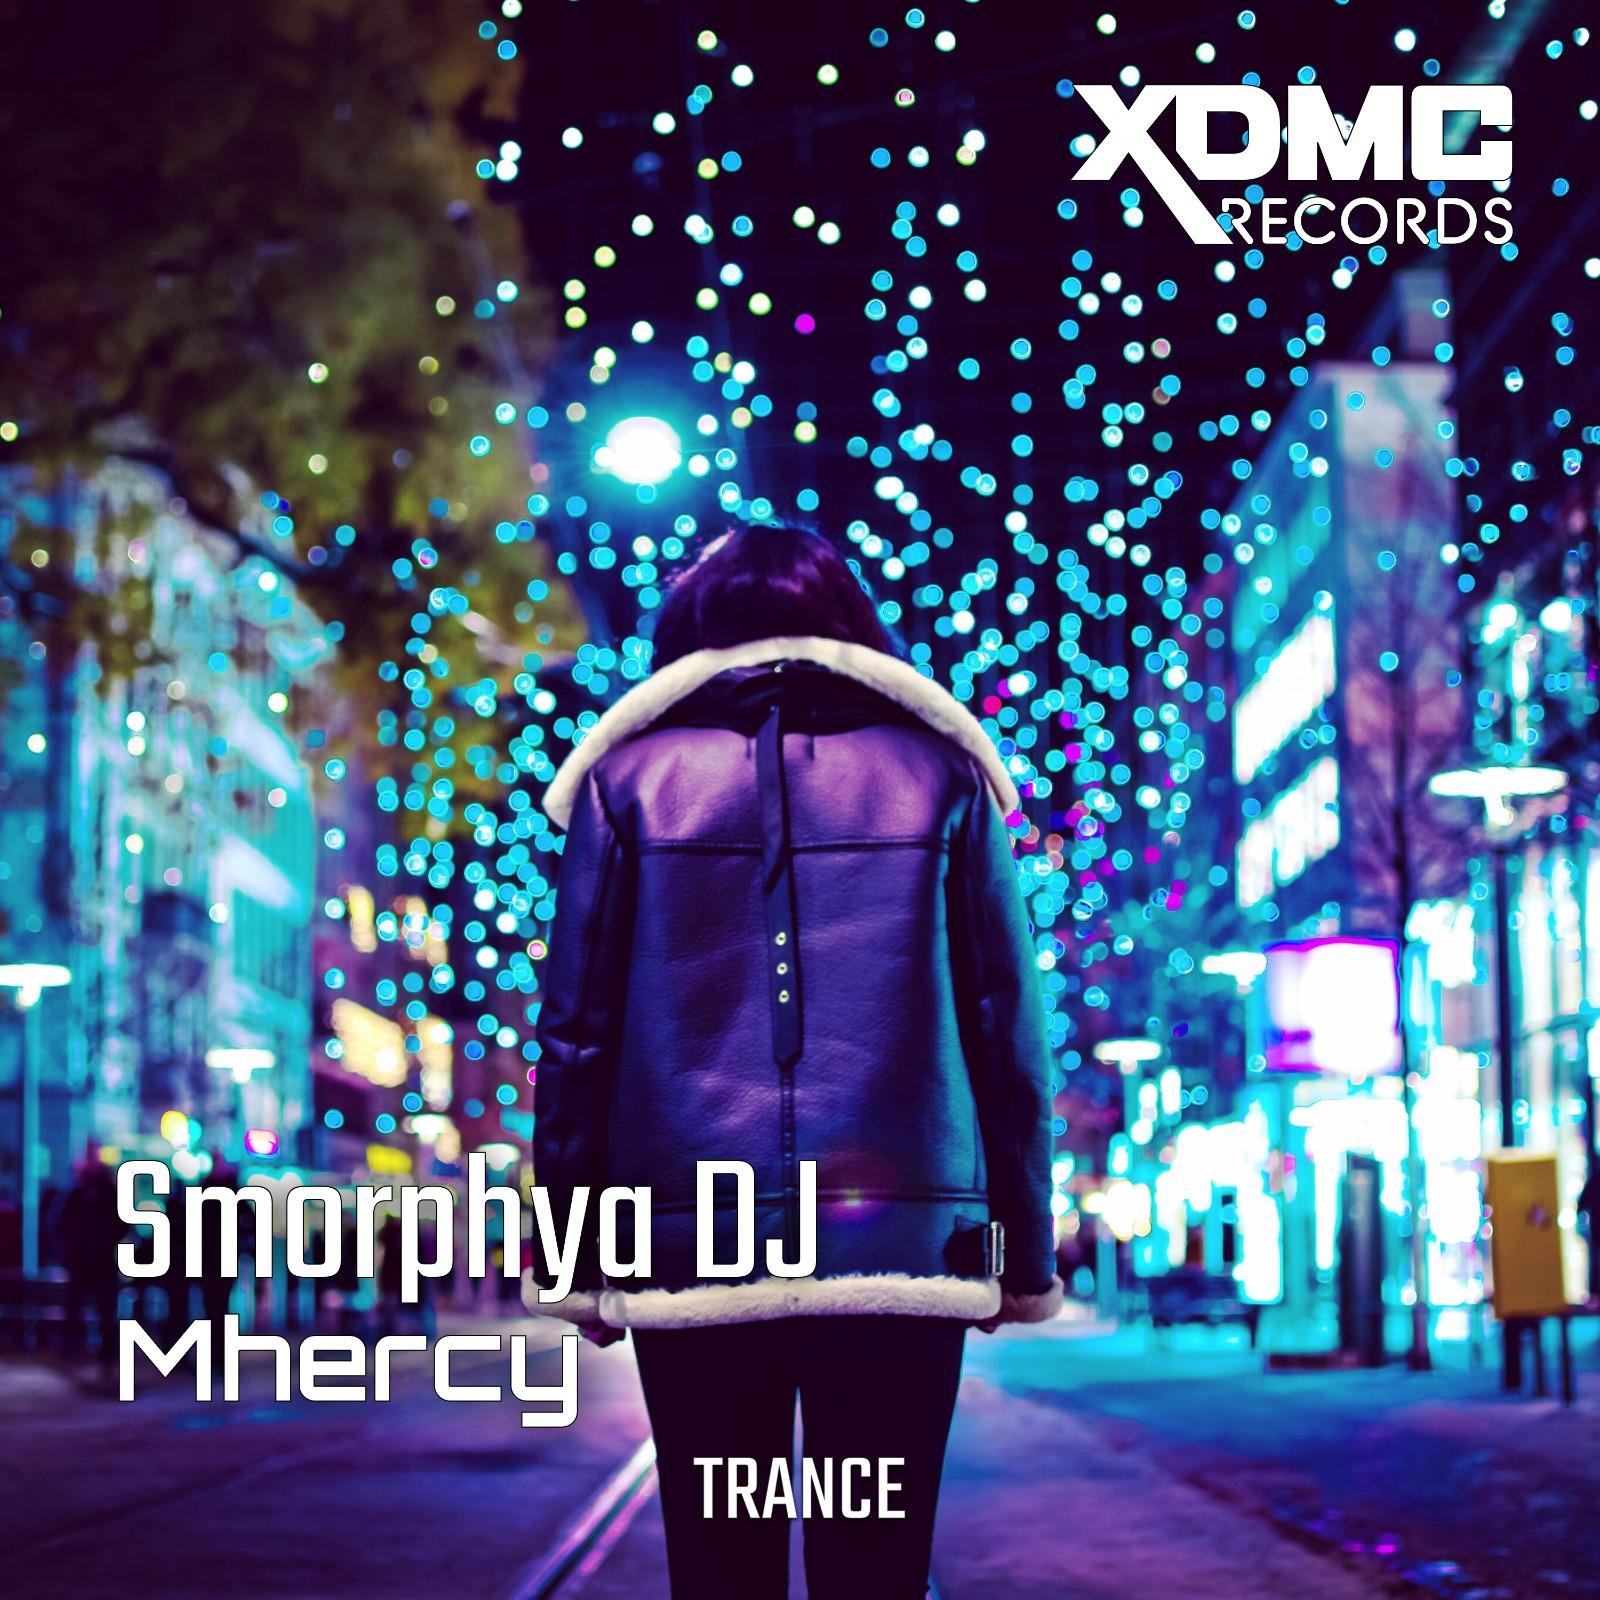 prod_track-files_97265_album_cover_Smorphya-mhercy-album_cover.jpeg